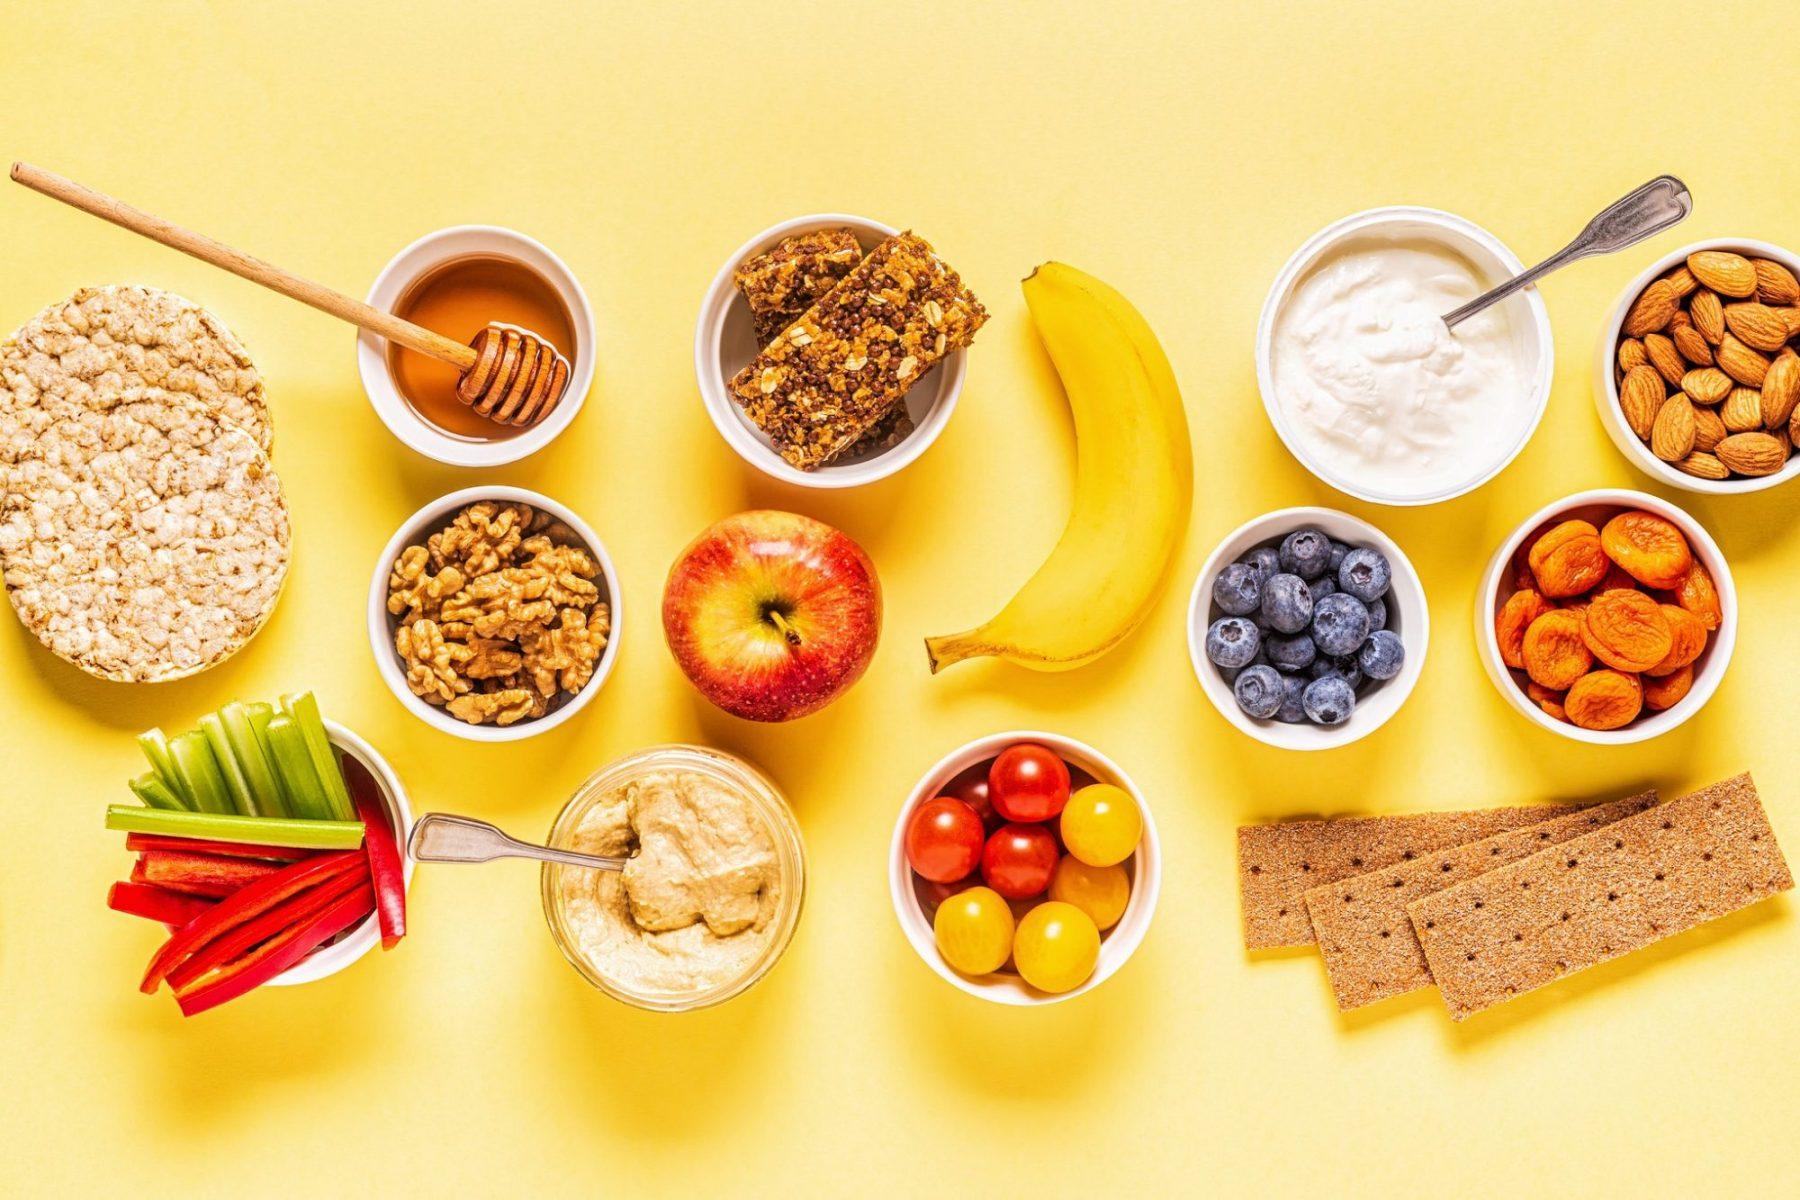 Northwest Arkansas Alternative Snack Choices | Better-for-You | Healthy Break Room